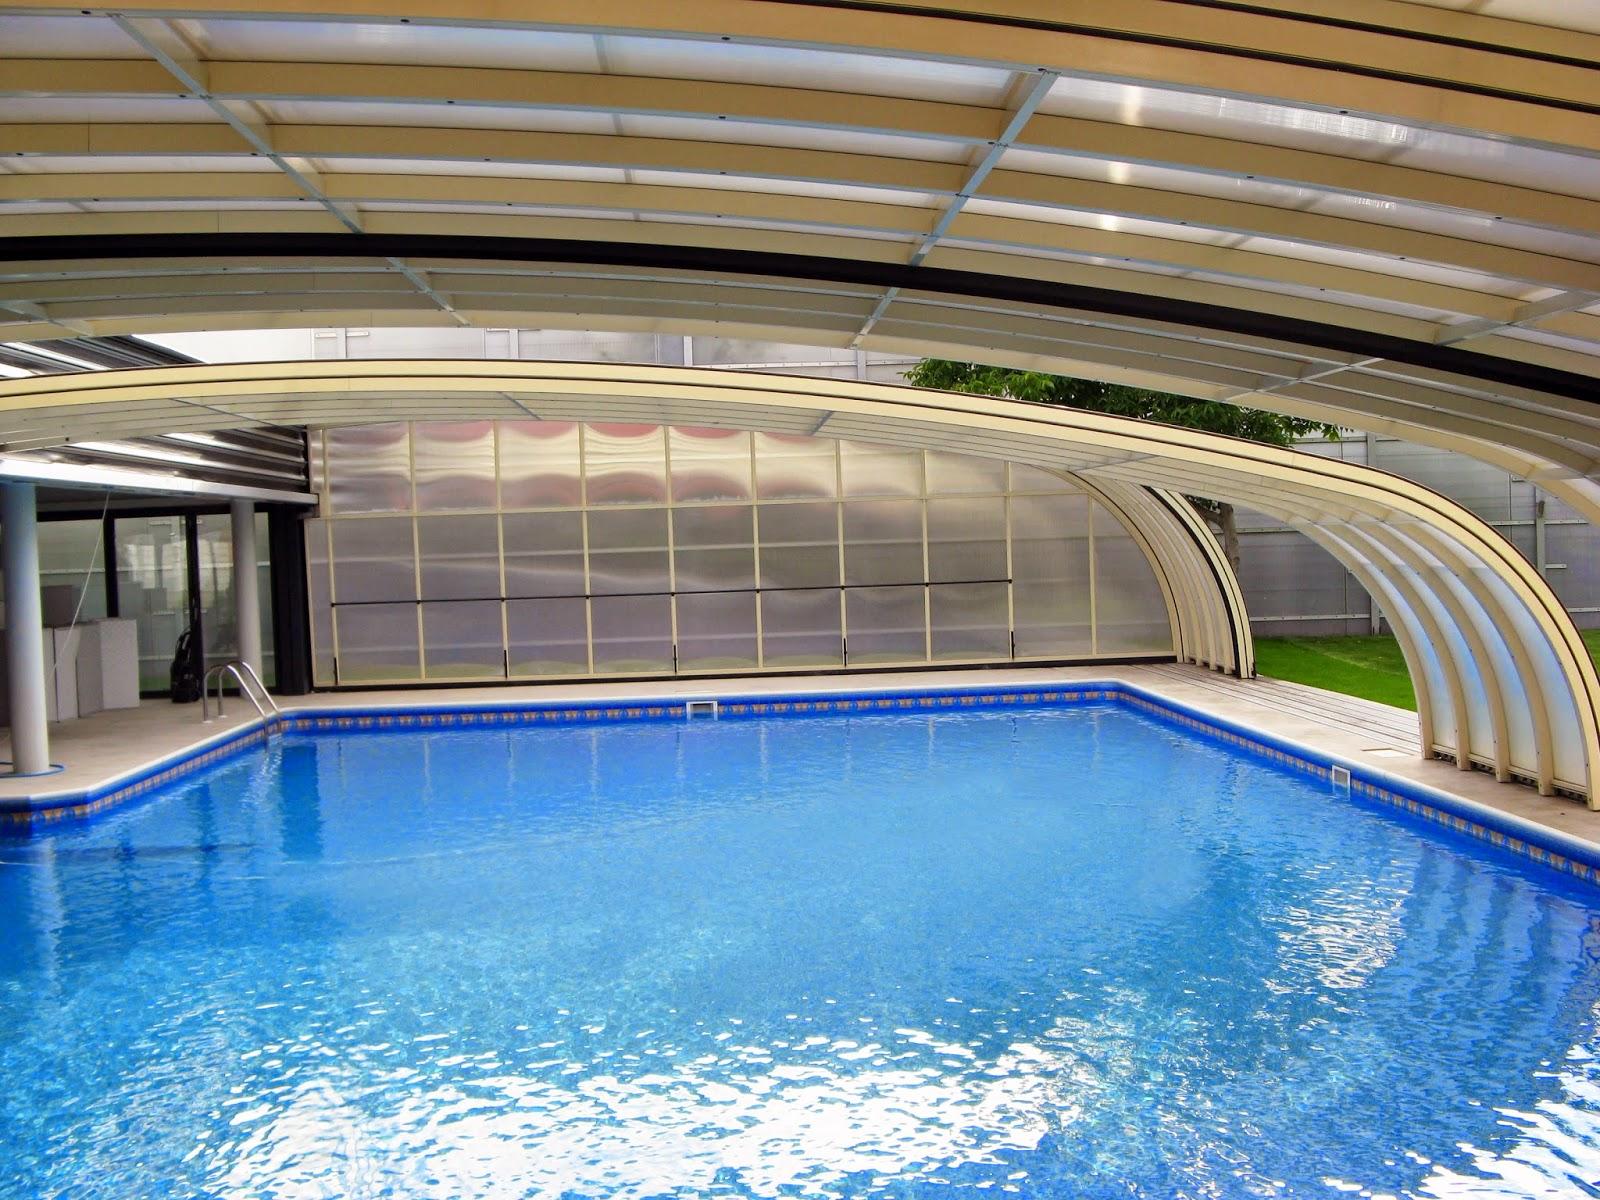 Pool Enclosures Blog: February 2015